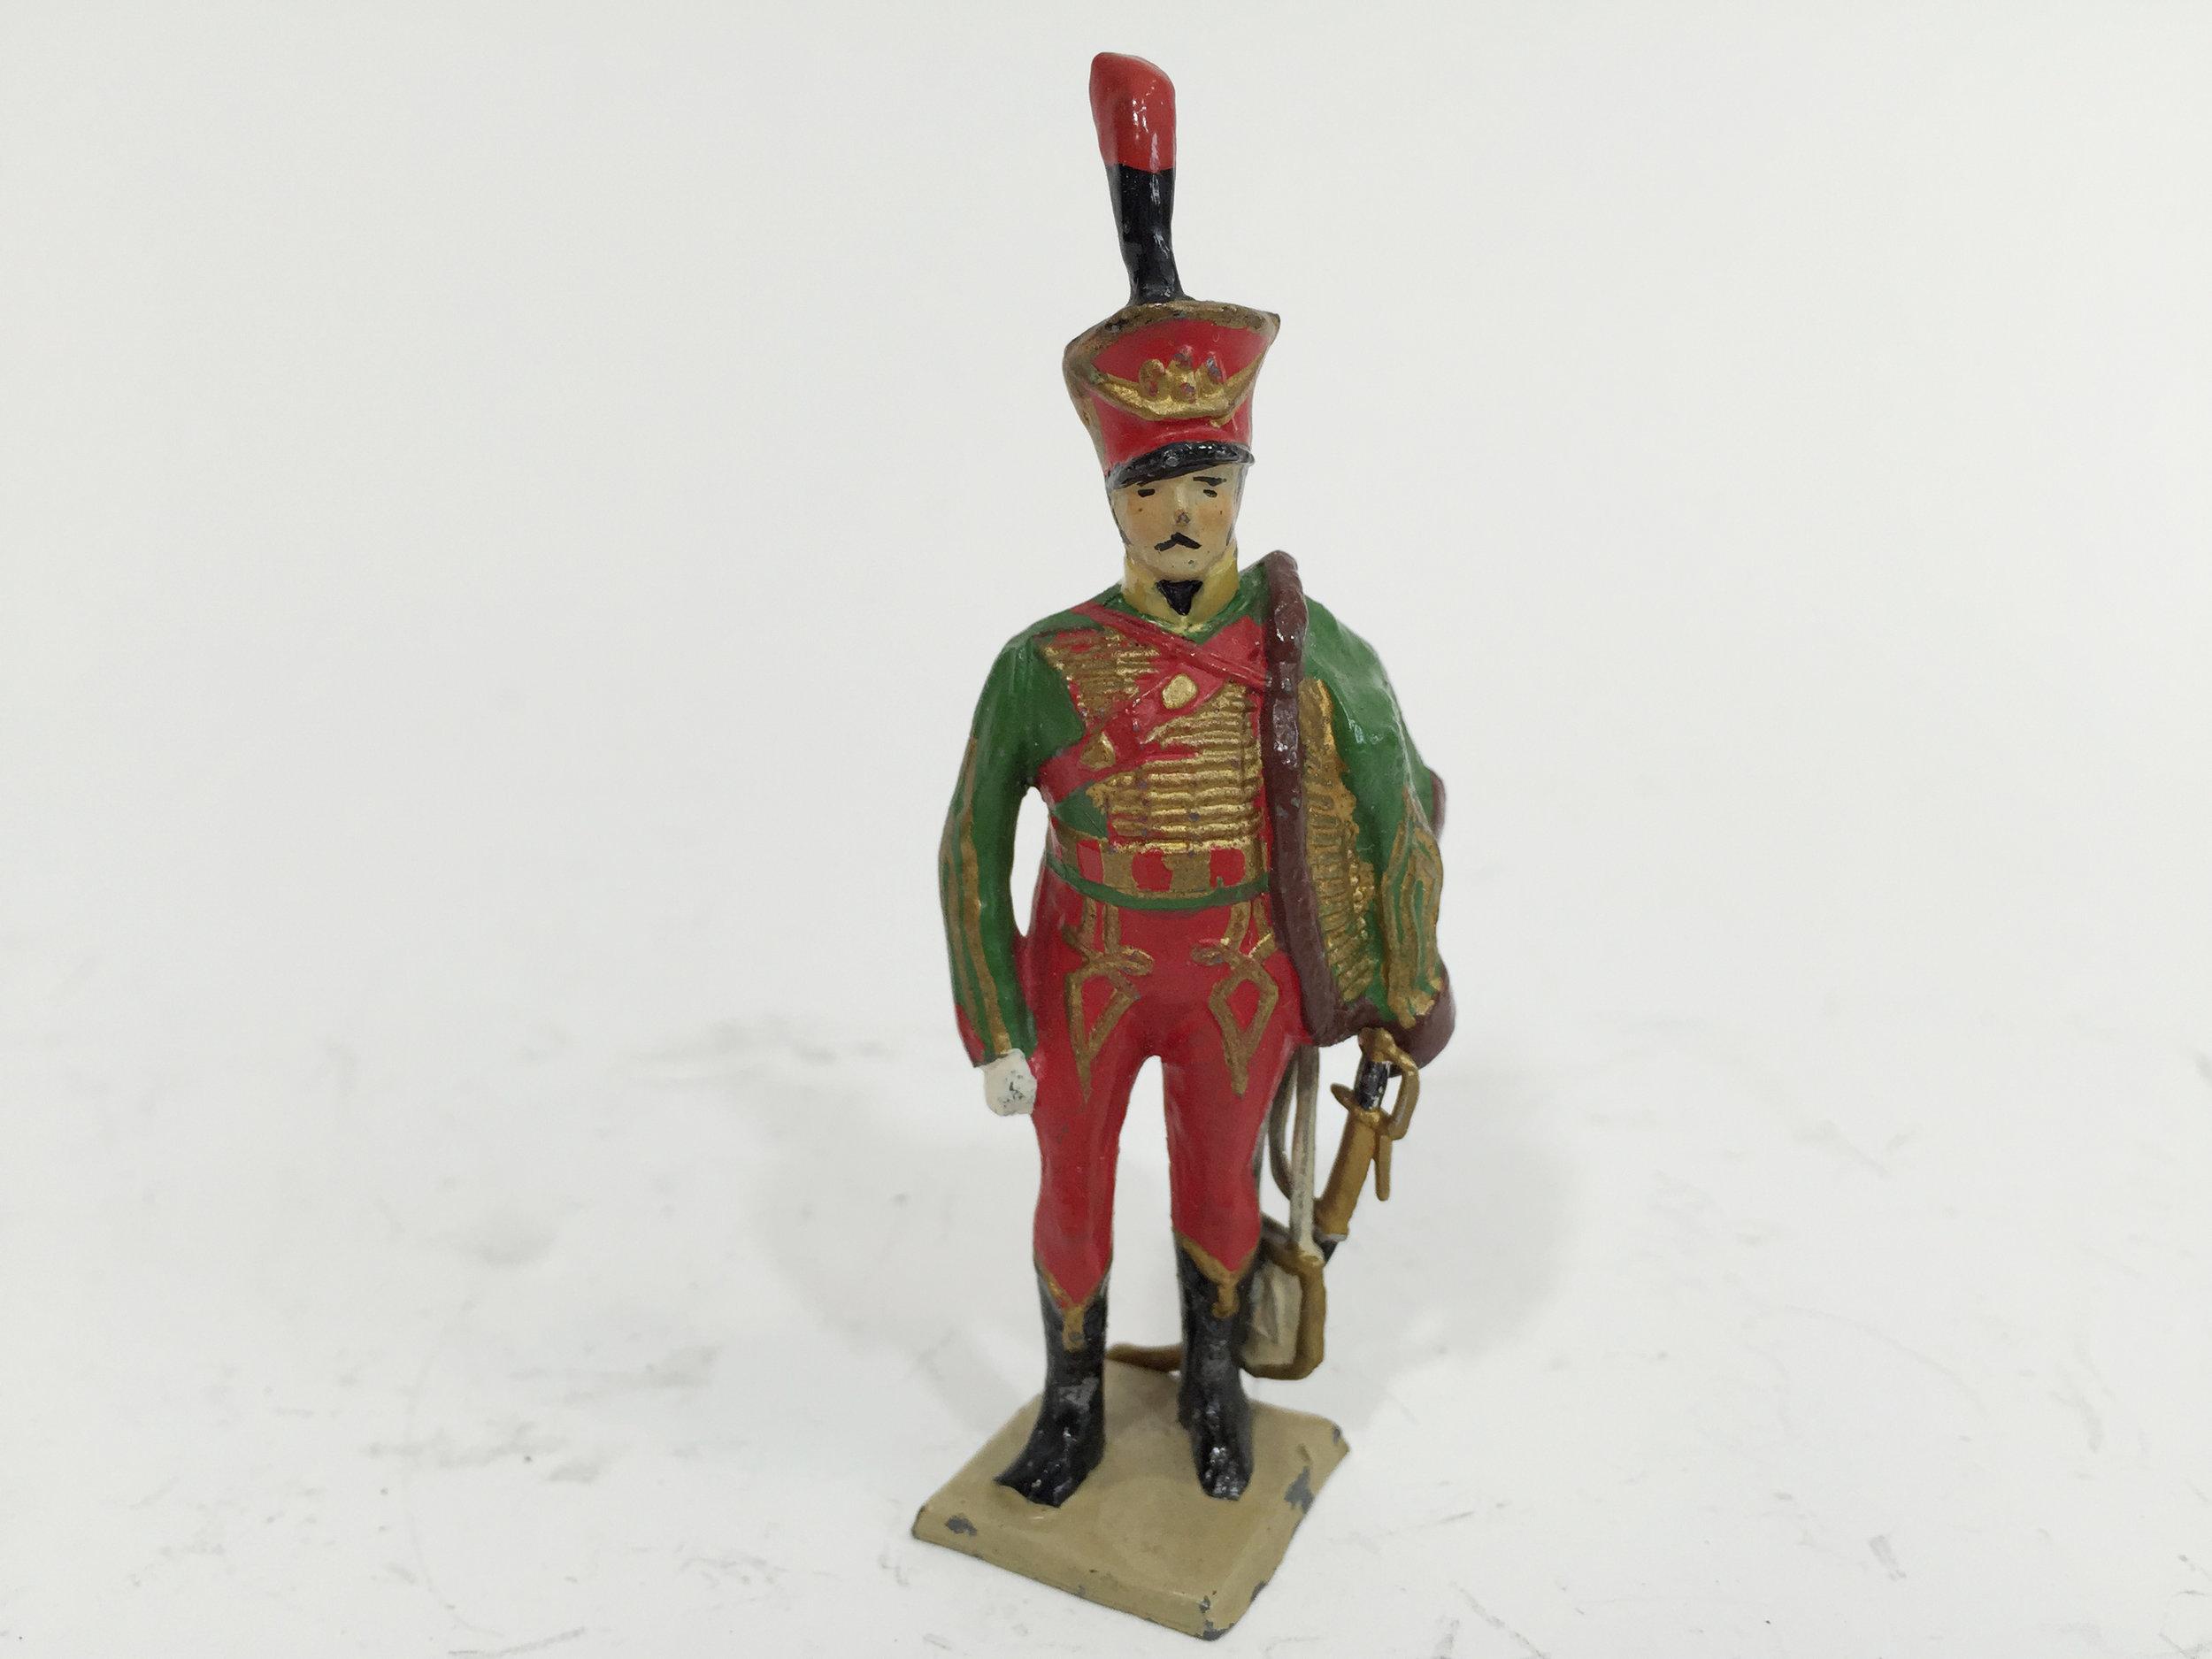 Vertunni, Officer 7th Hussars